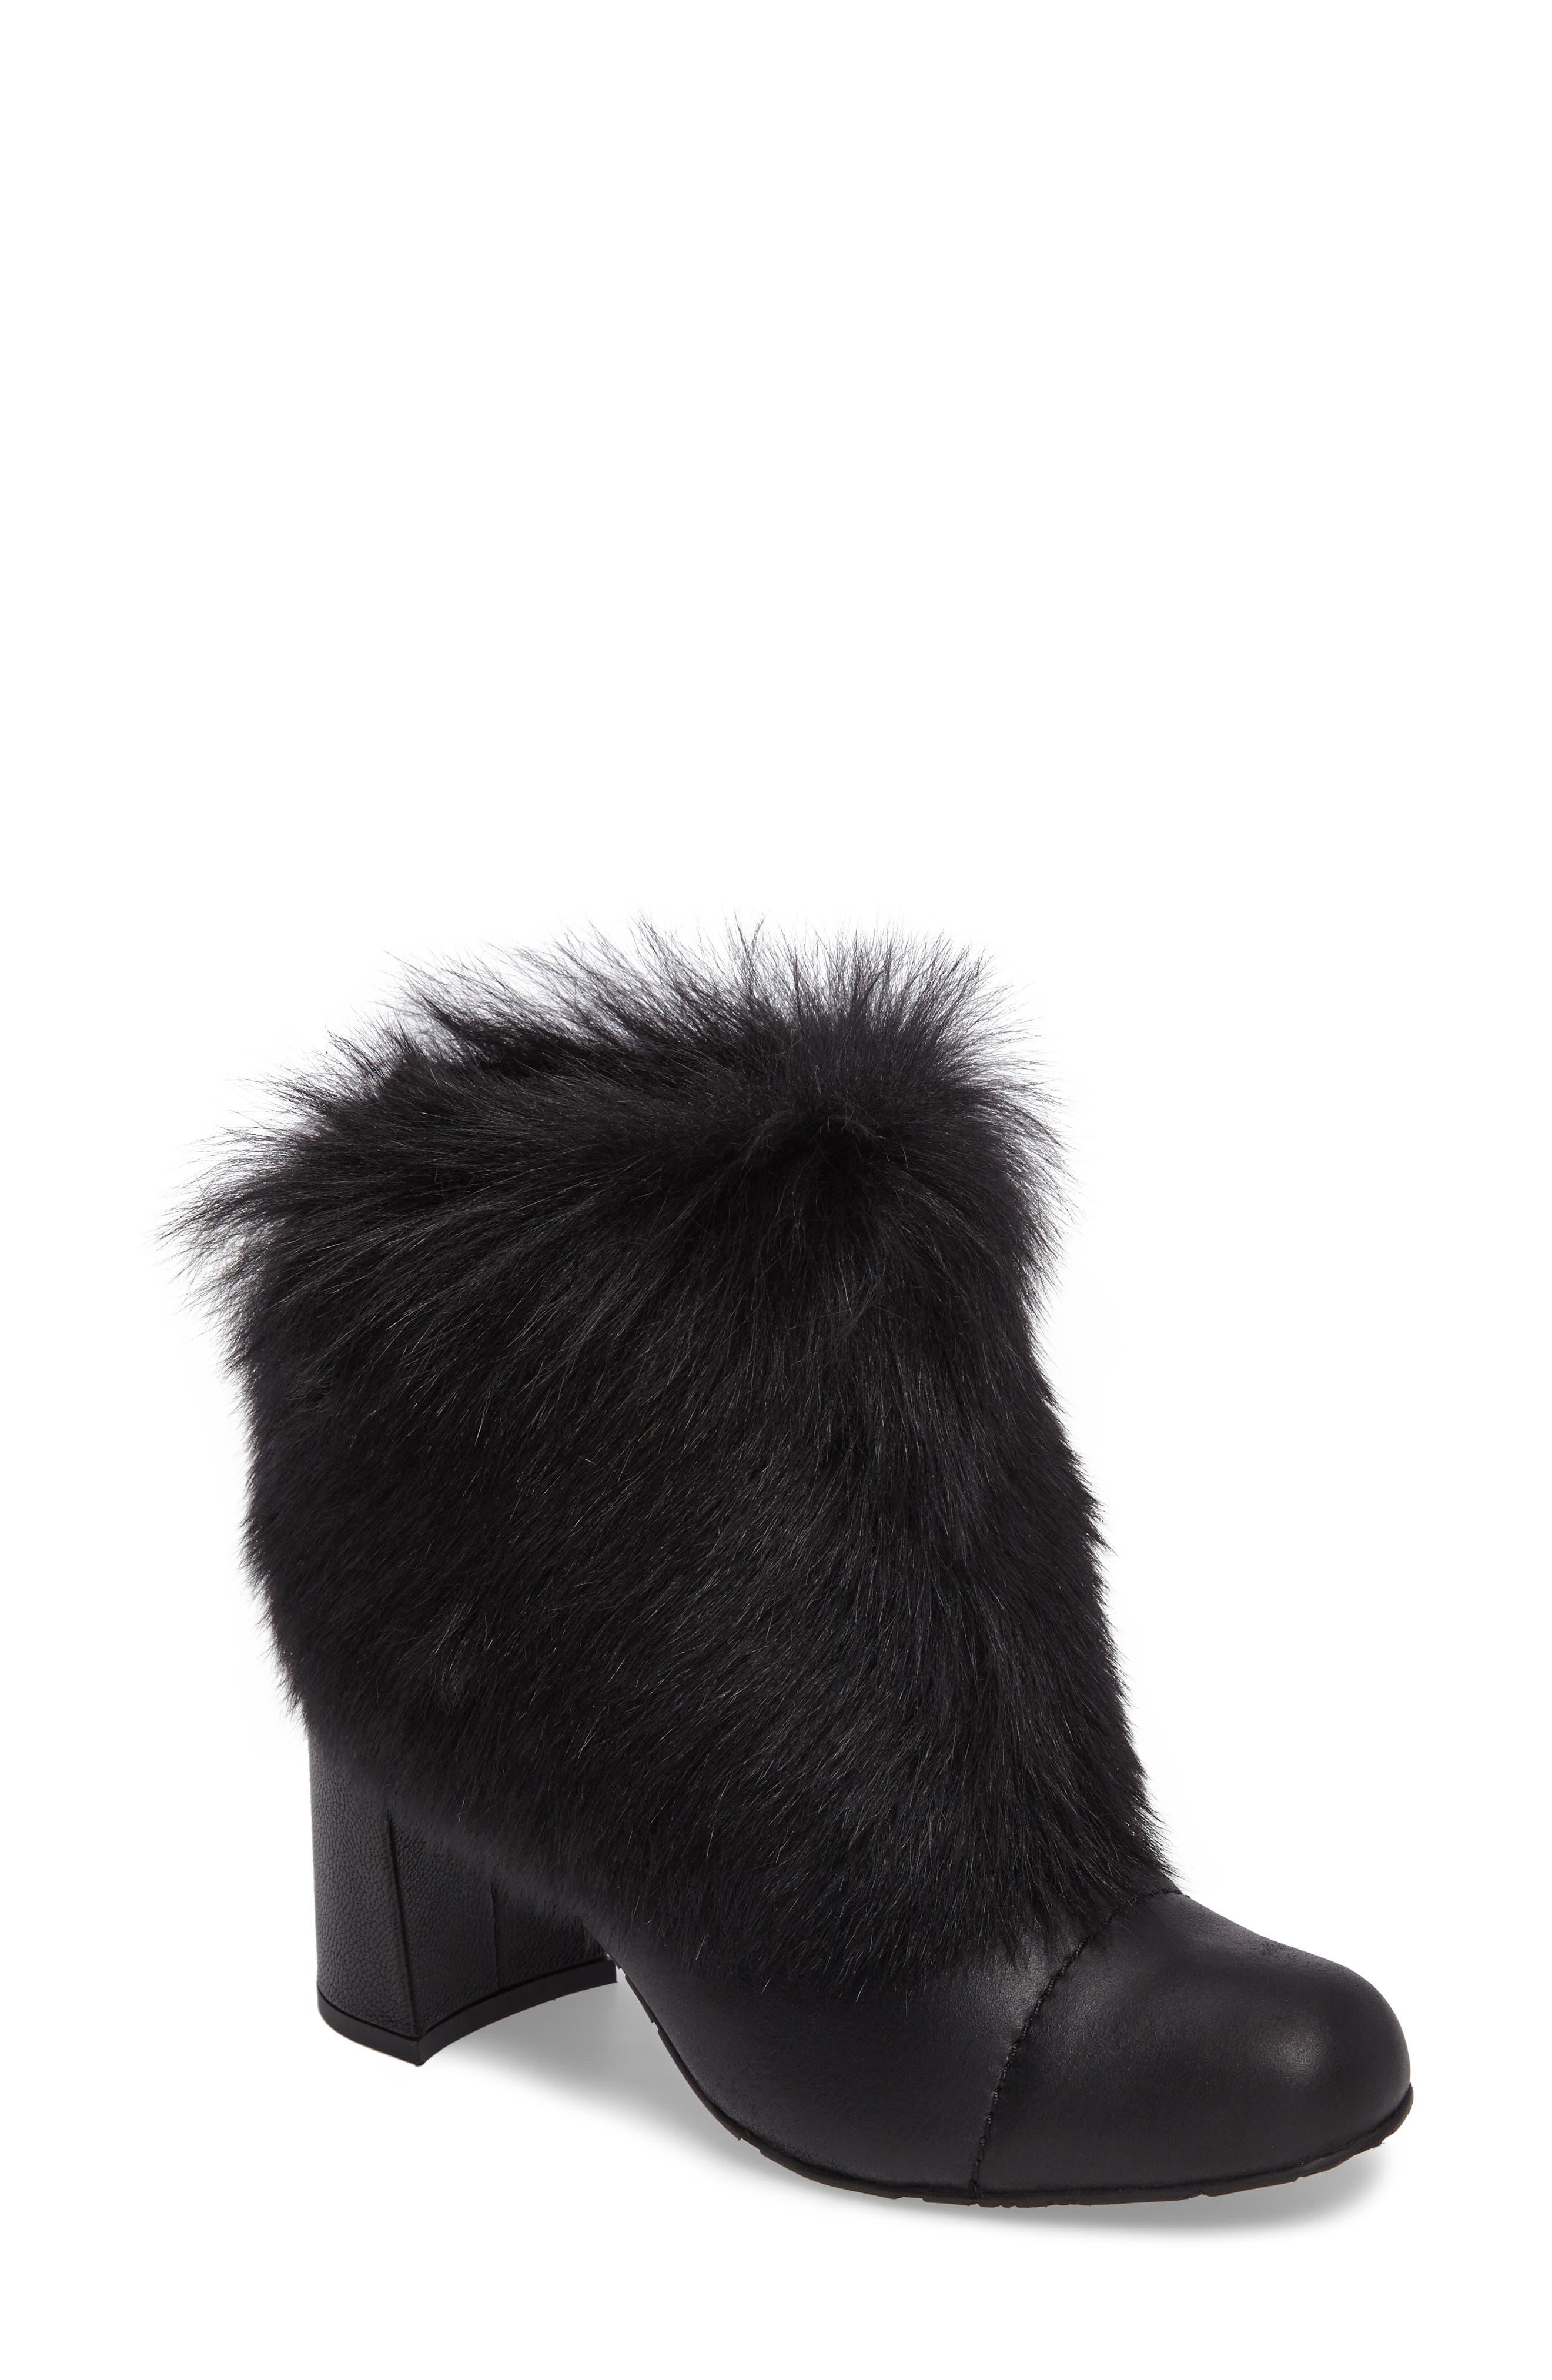 Alternate Image 1 Selected - Pedro Garcia Woka Genuine Shearling Bootie (Women)